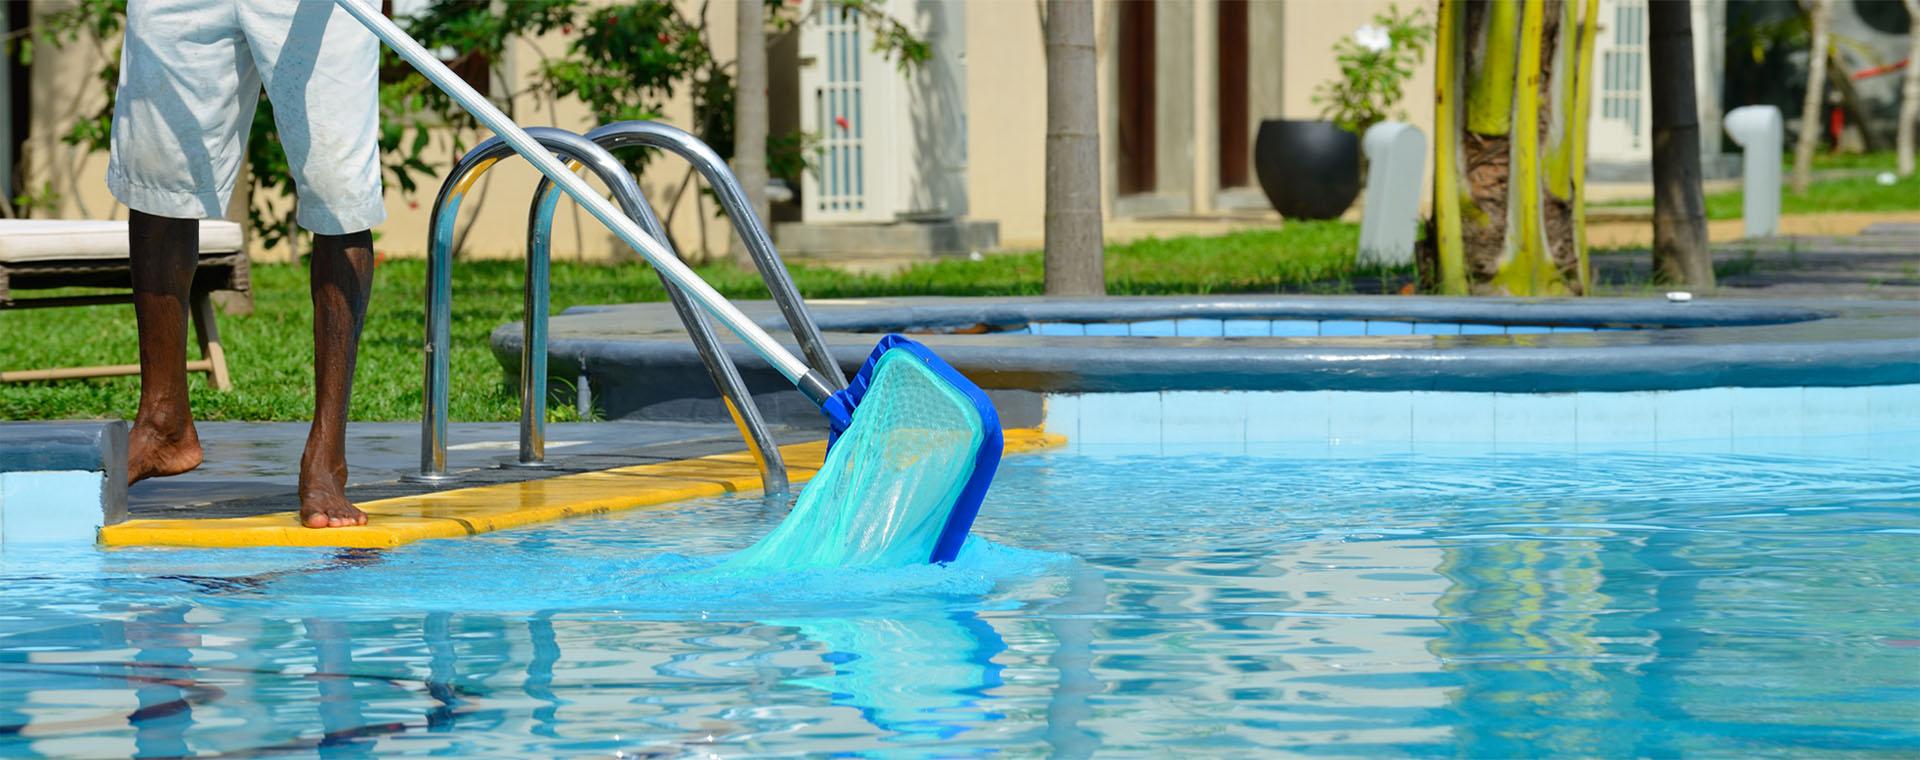 Best Pool Cleaner of 2018